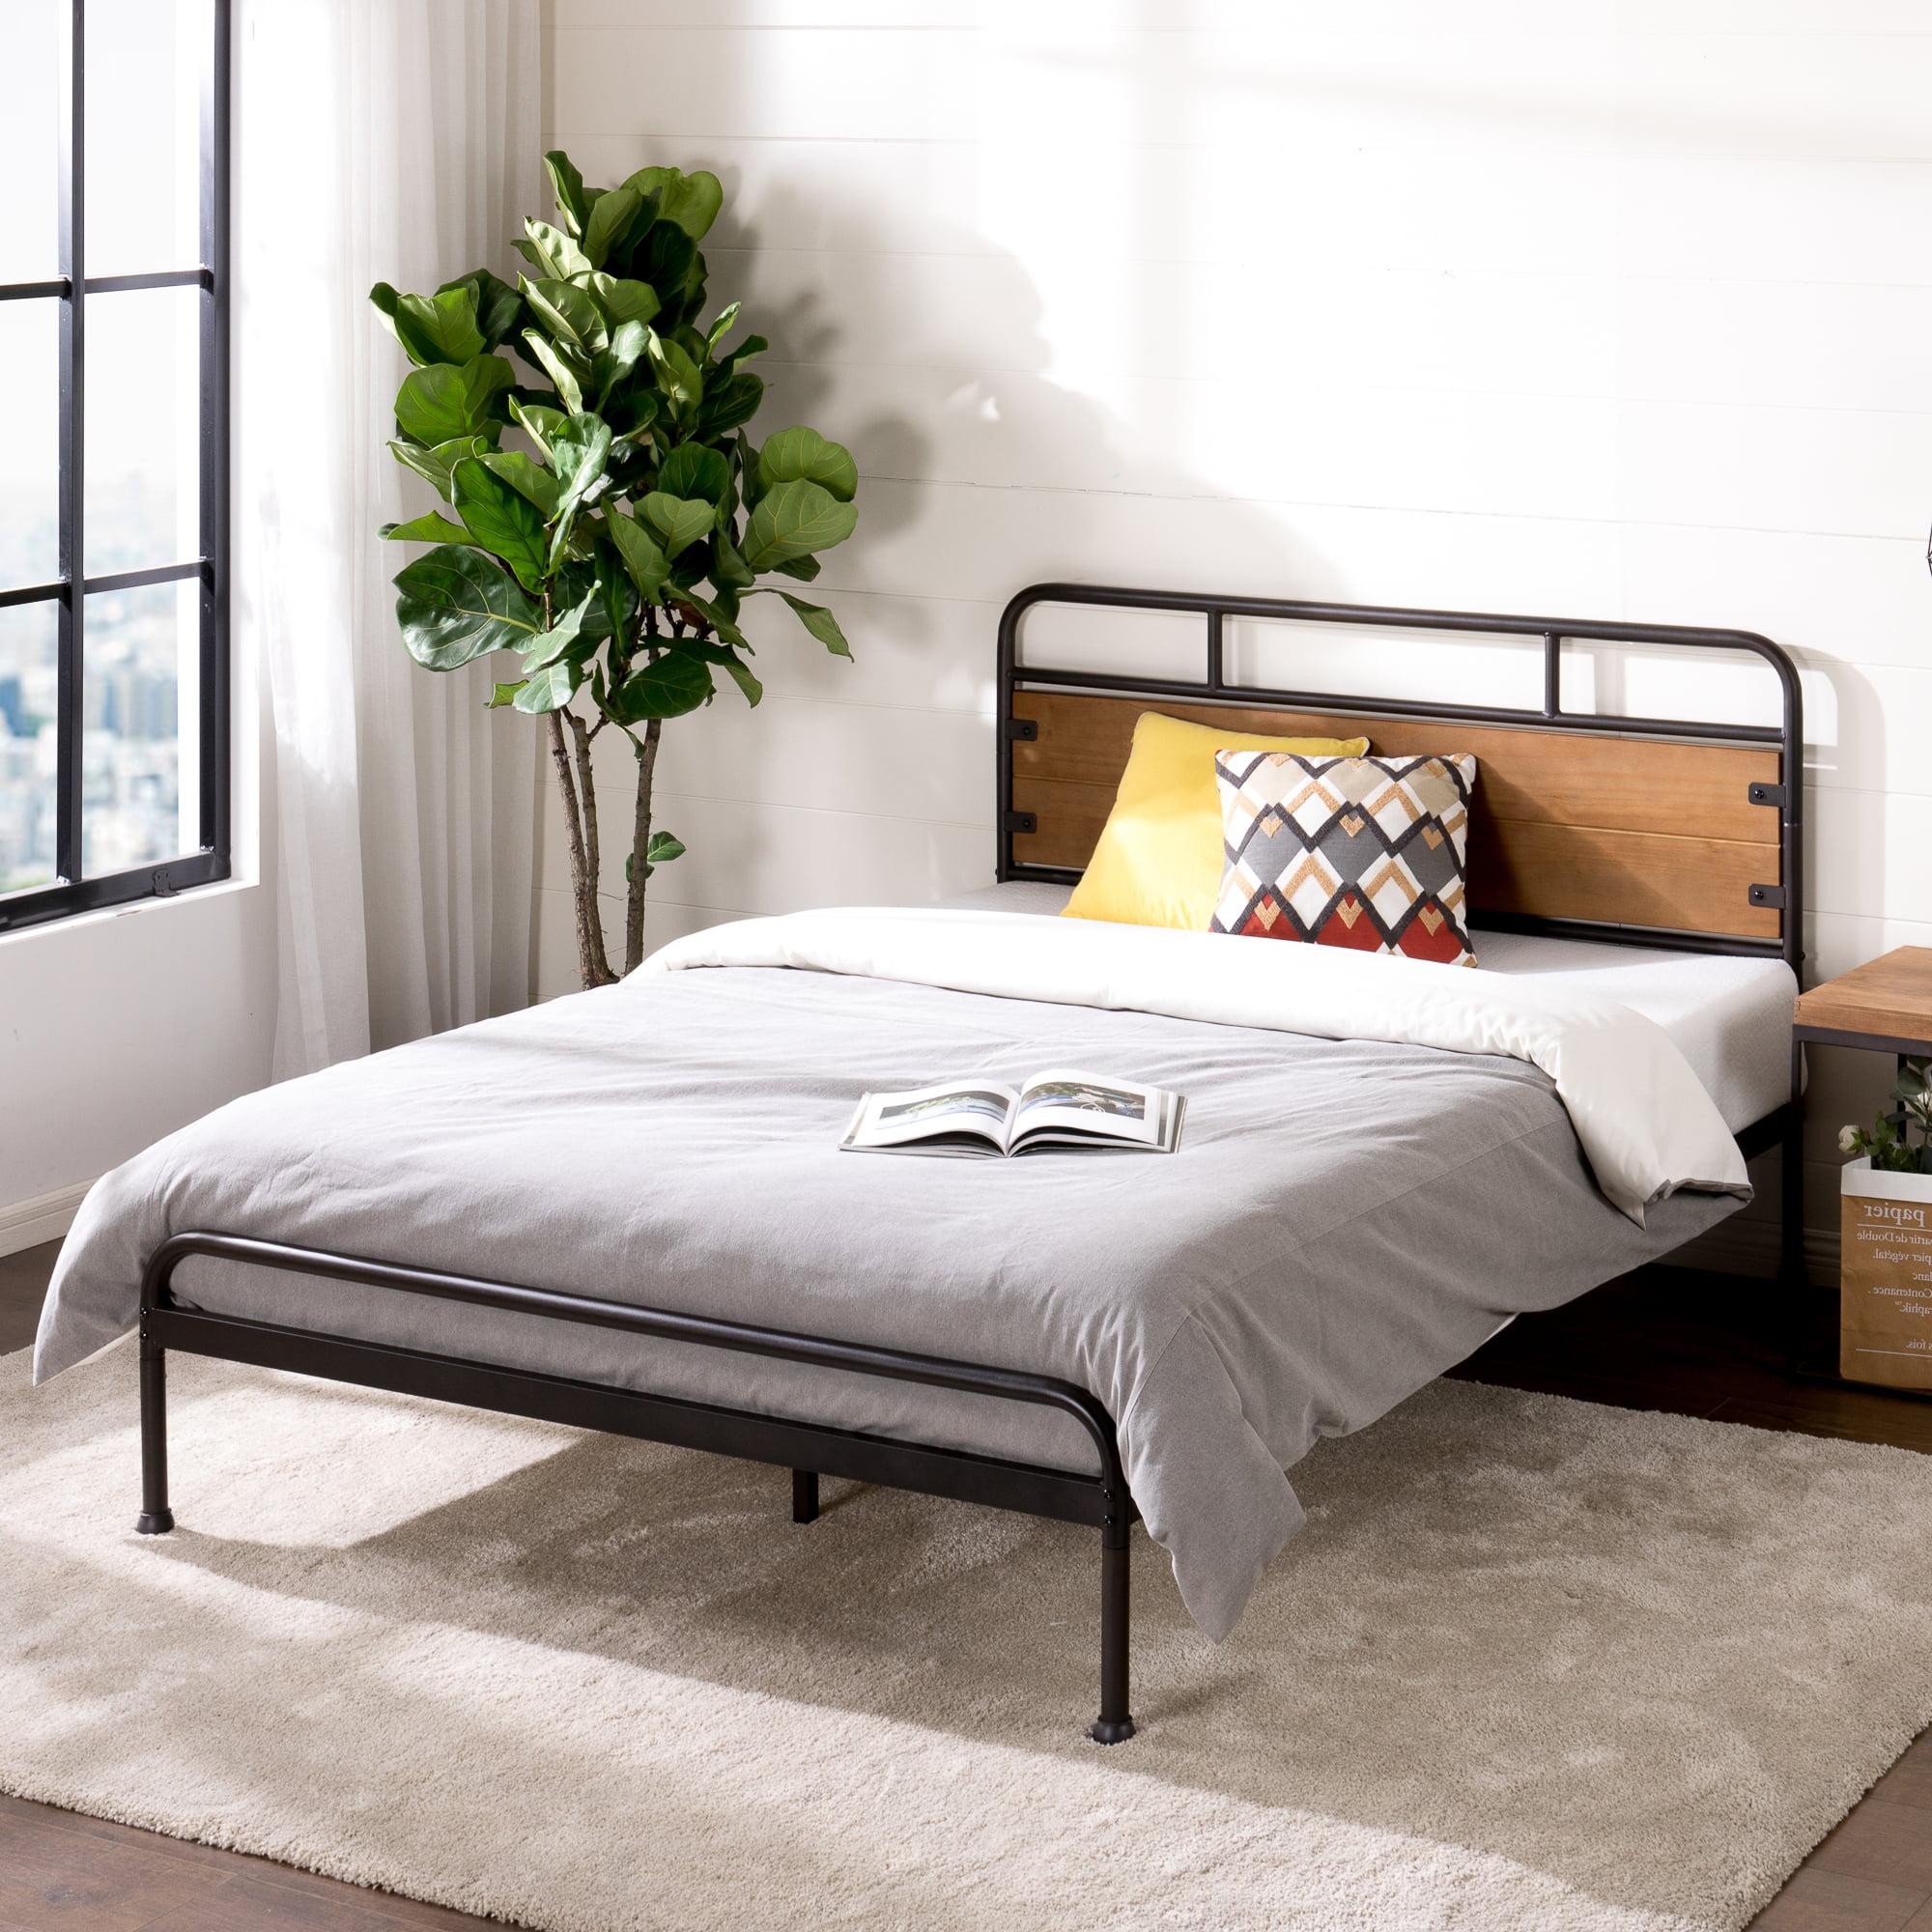 Zinus Eli 41 Metal And Wood Platform Bed Twin Walmart Com Walmart Com